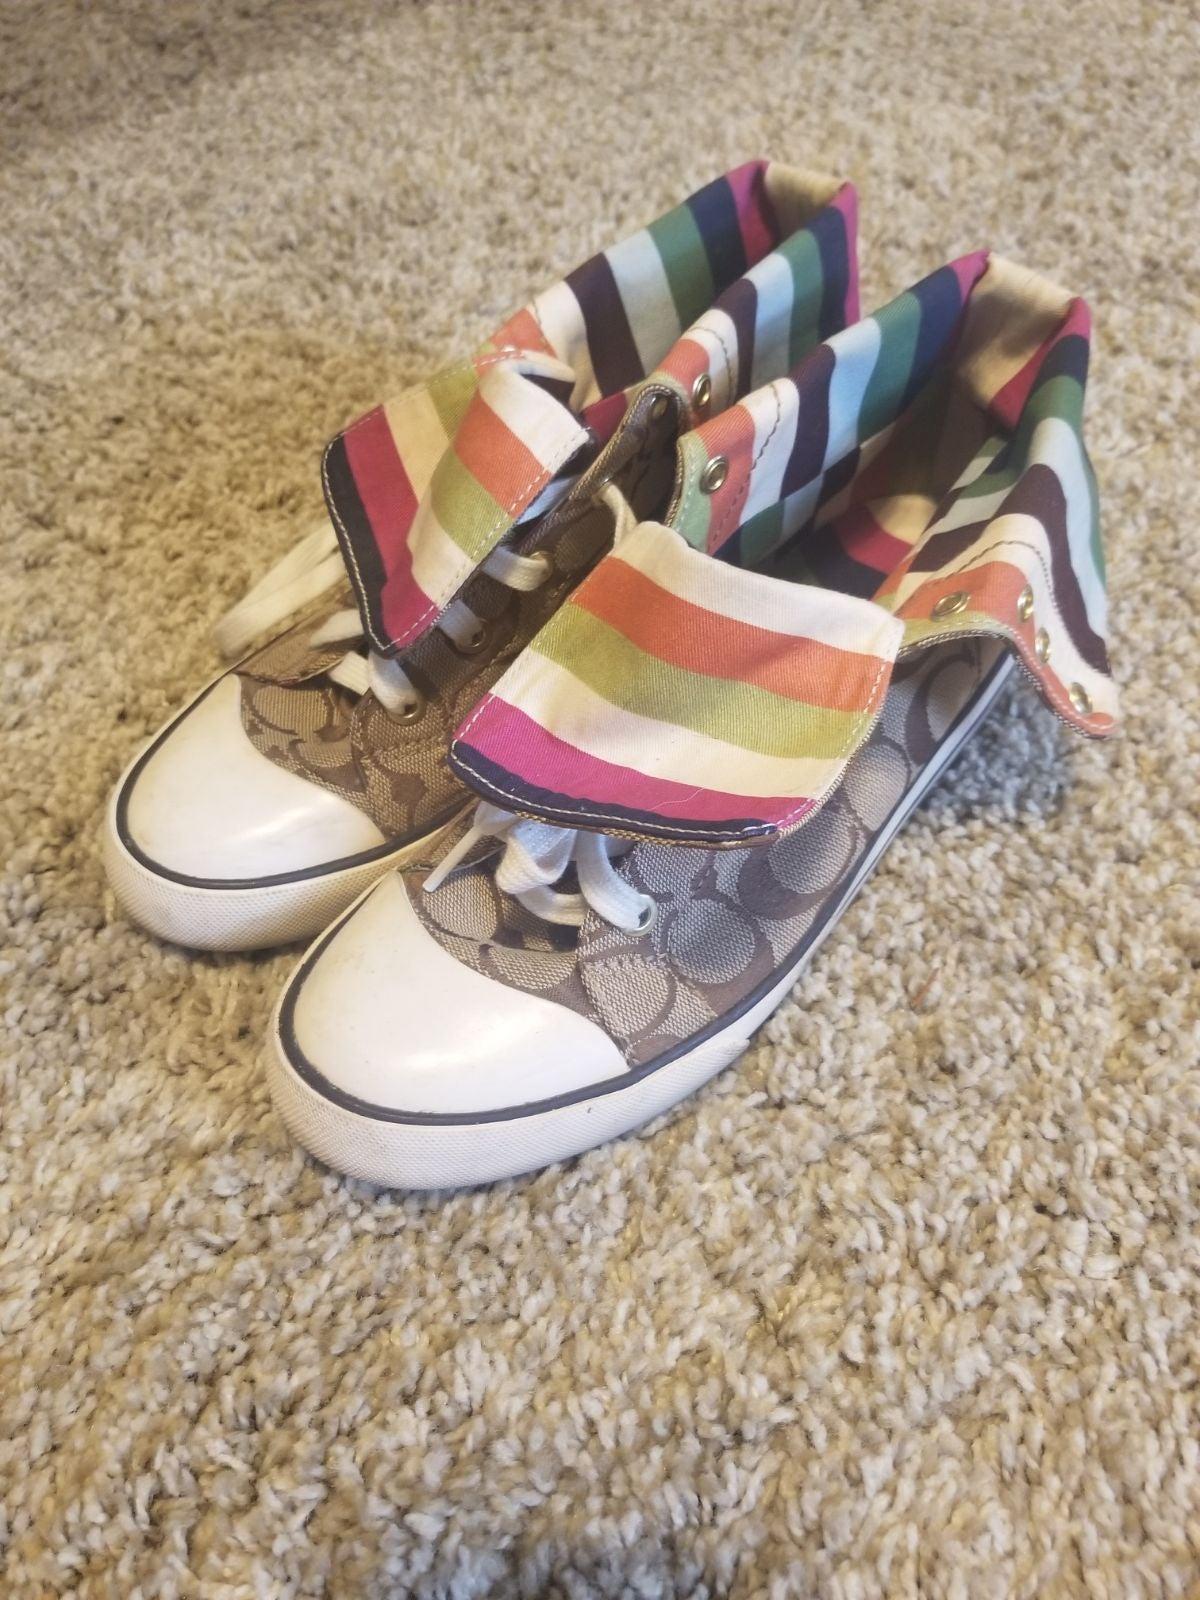 Coach signature bonney hightop sneakers